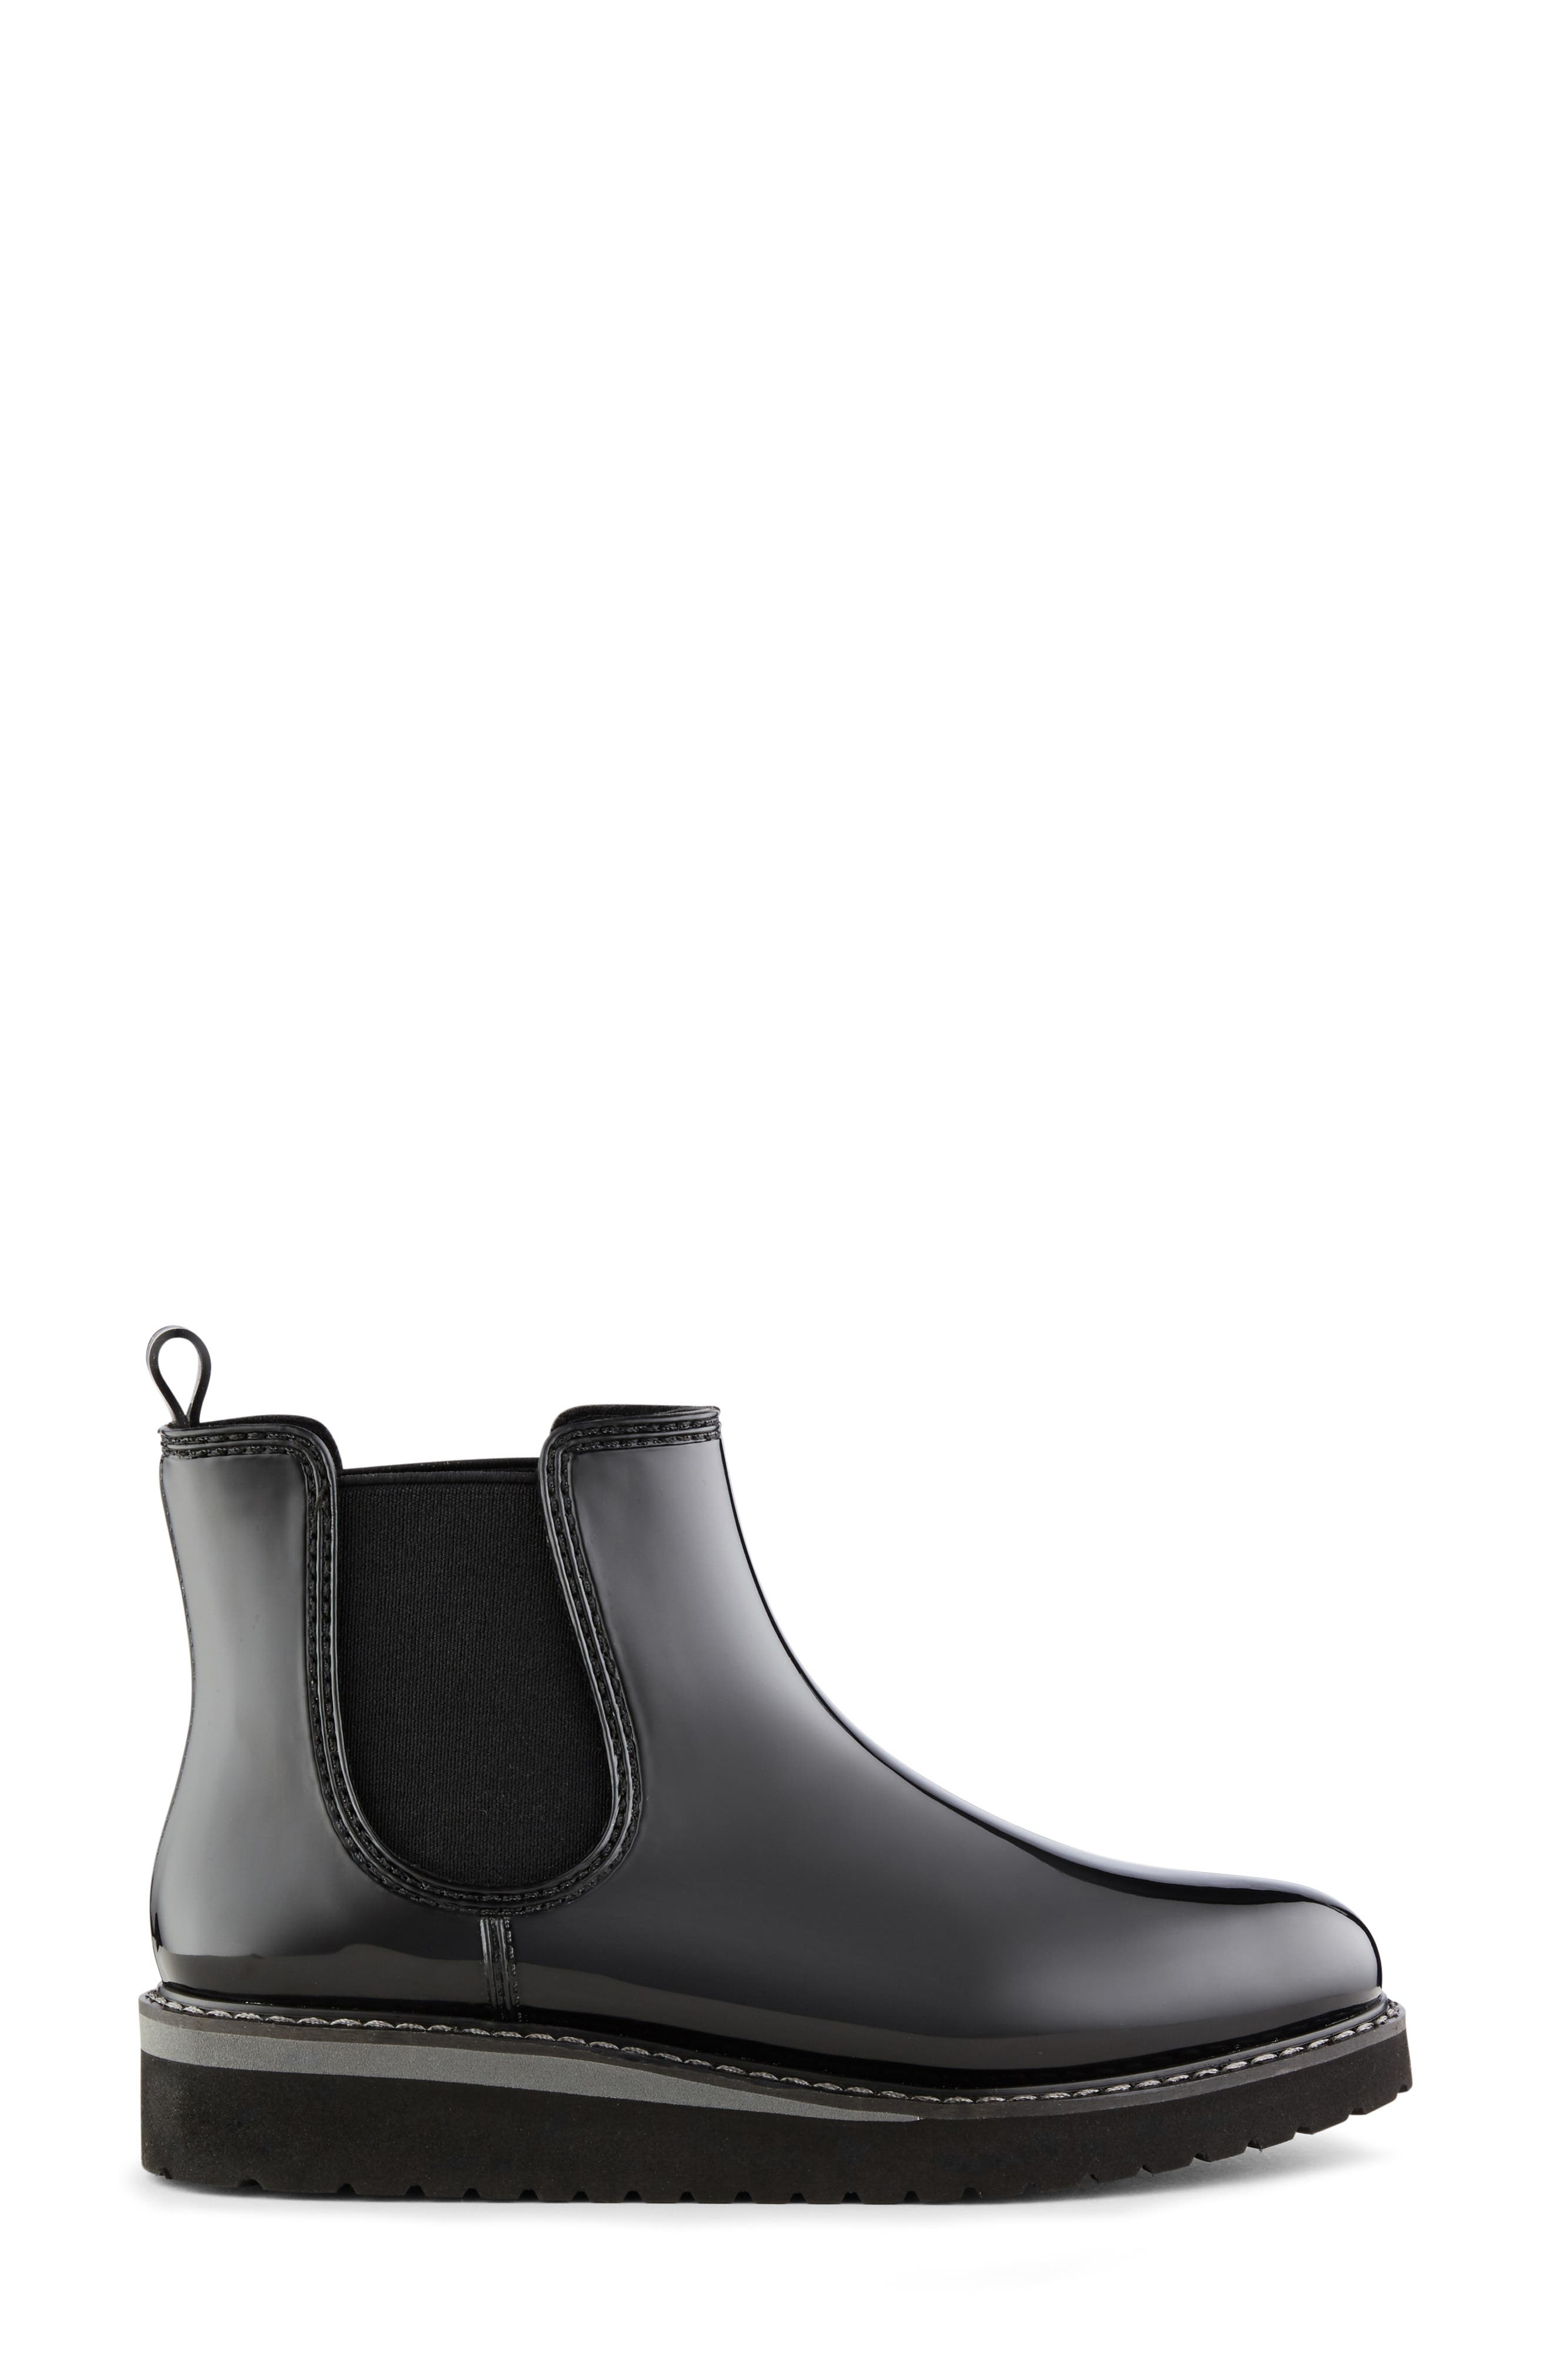 COUGAR, Kensington Chelsea Rain Boot, Alternate thumbnail 2, color, BLACK/ CHARCOAL